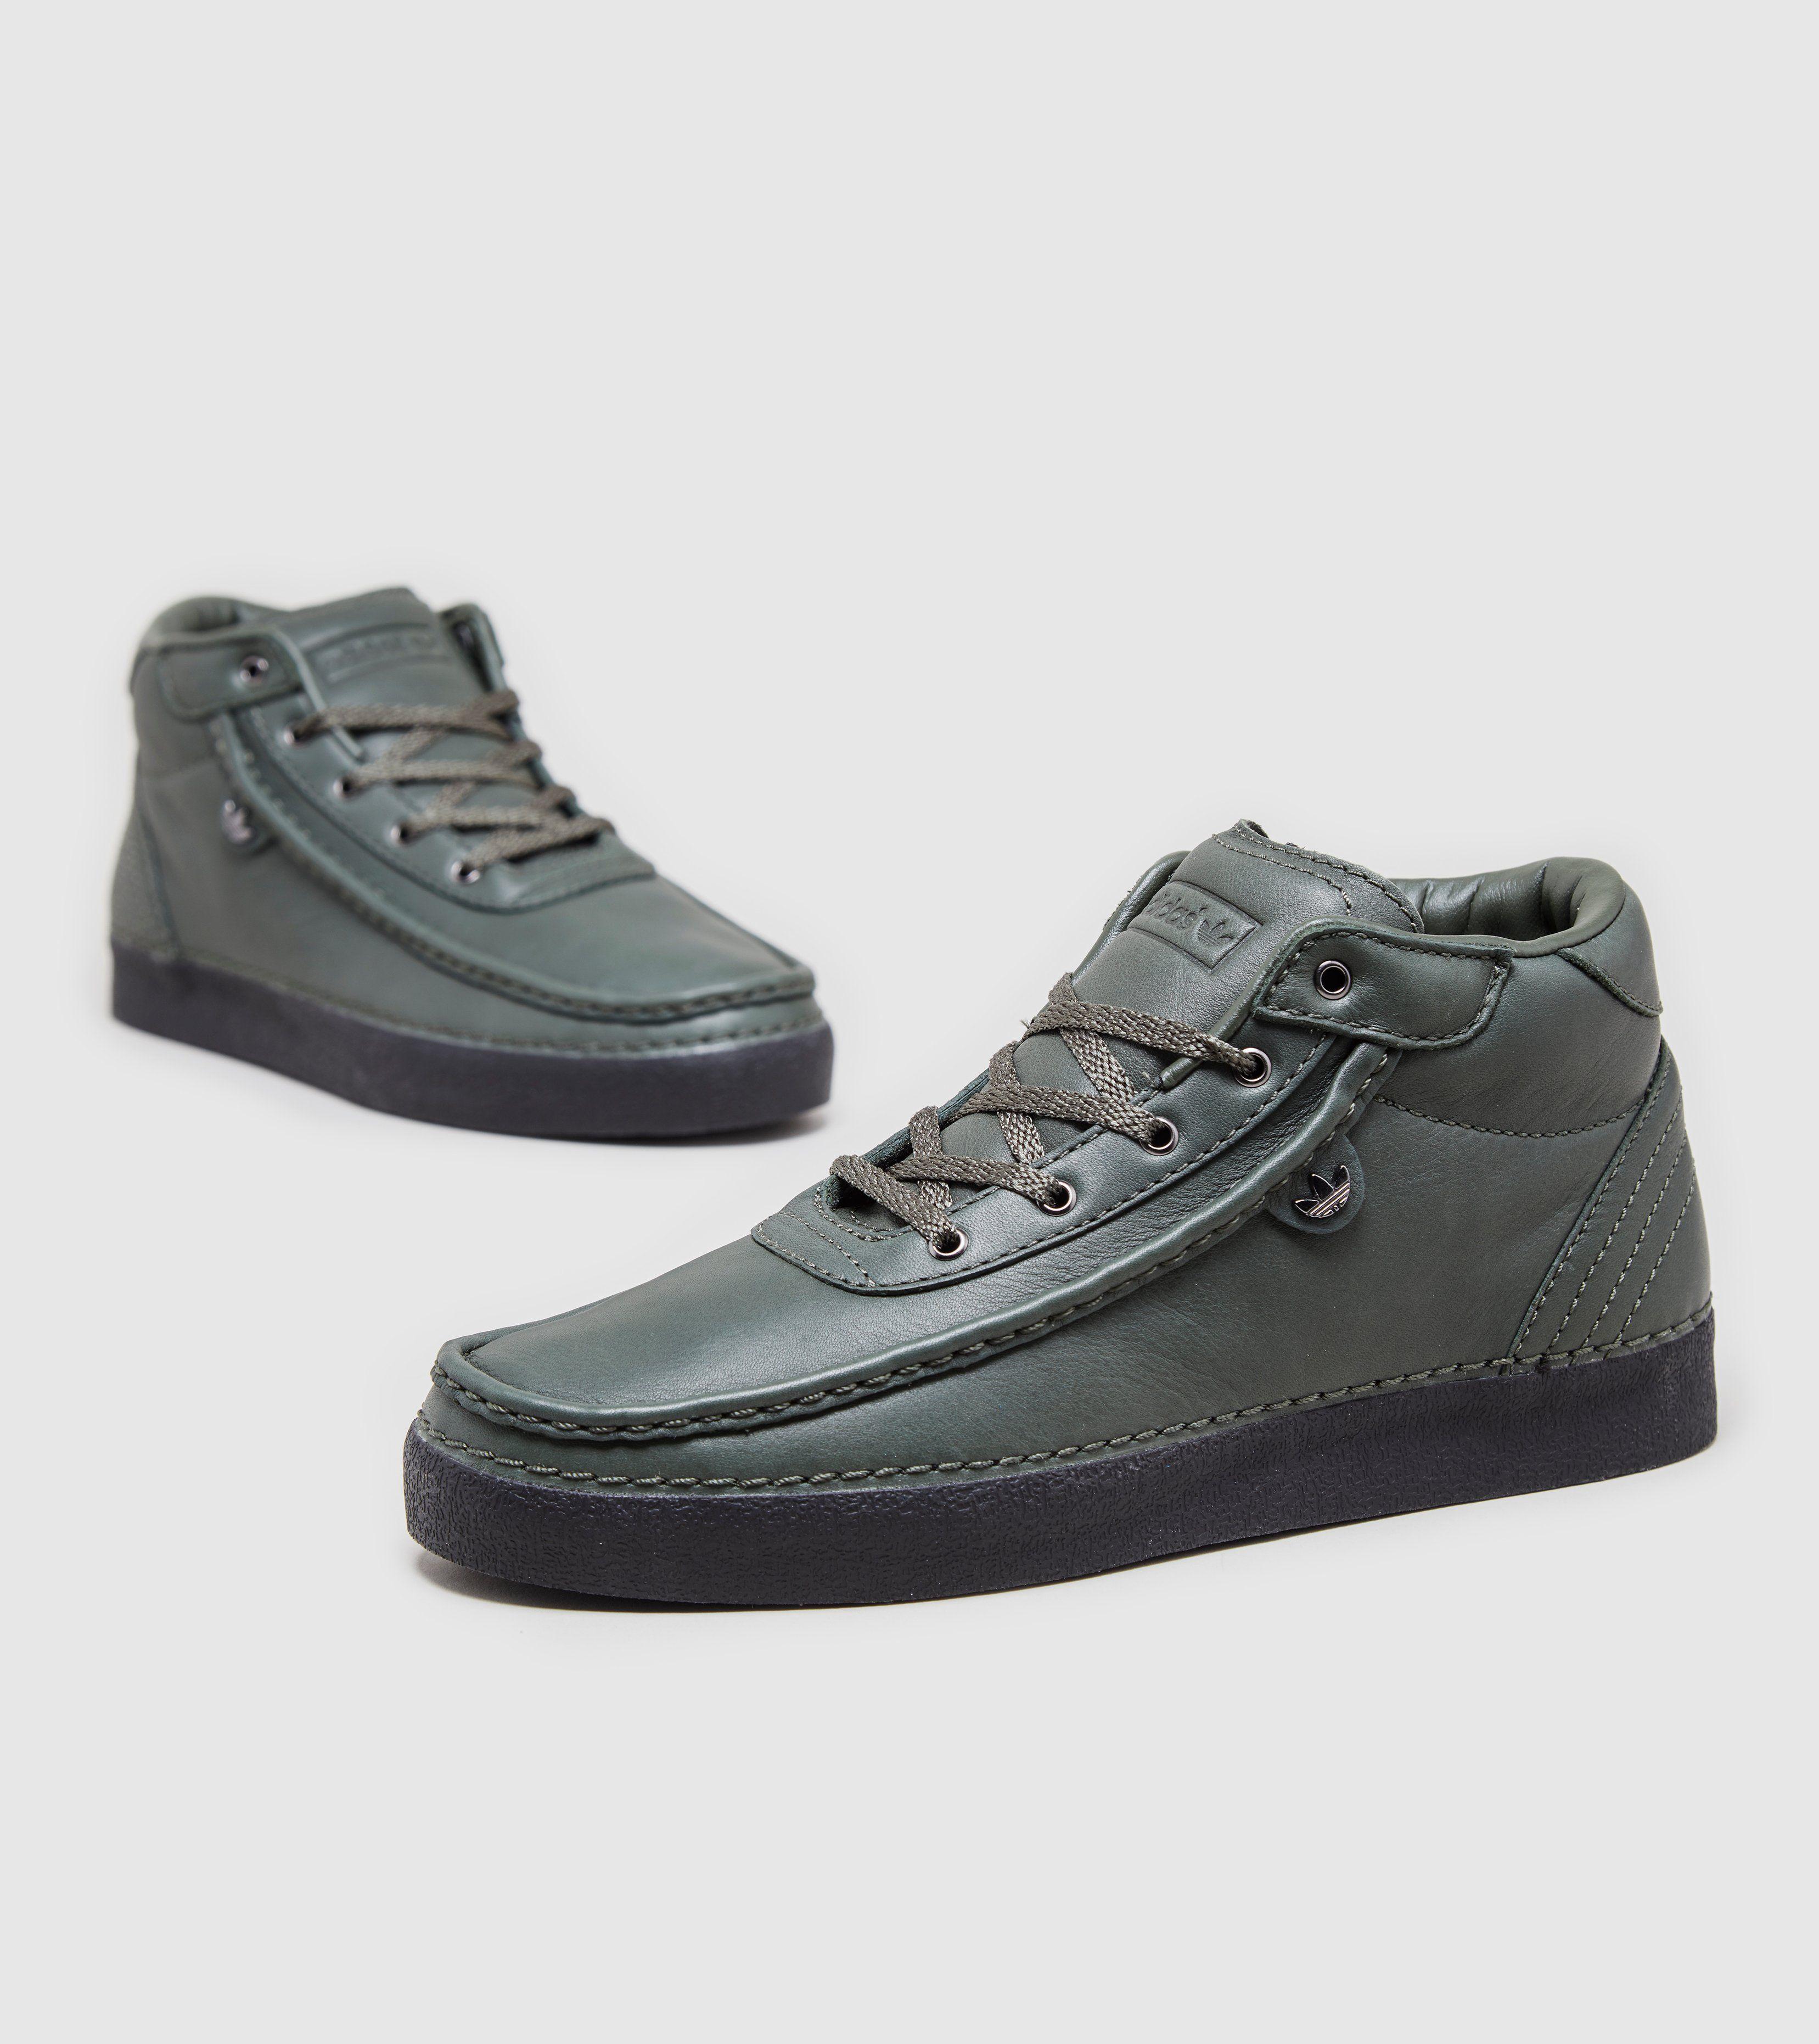 ¿Adidas Originals Albrecht Mid Premium Leather size?¿Exclusivo de tamaño?